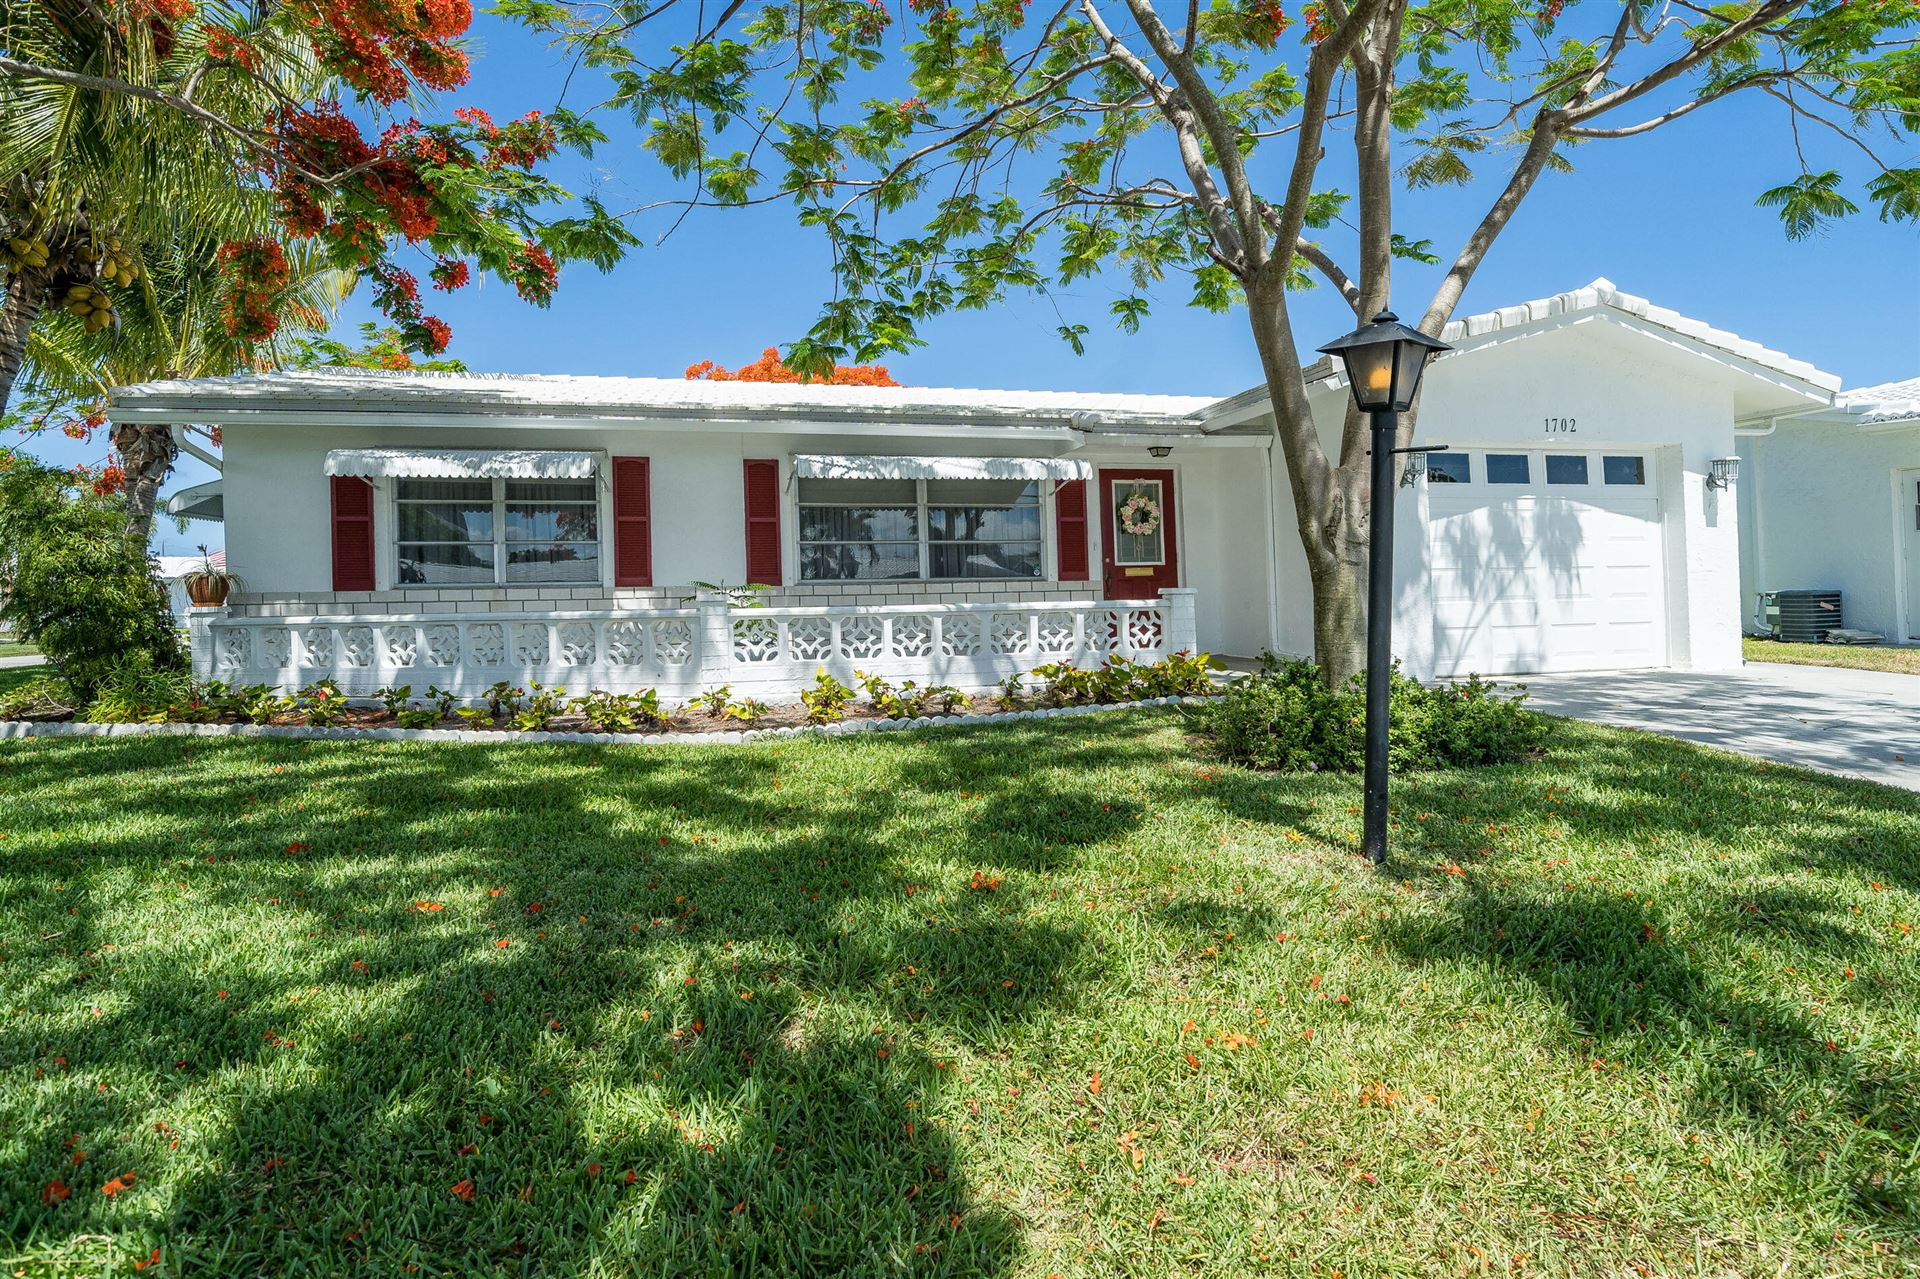 1702 SW 22nd Street, Boynton Beach, FL 33426 - MLS#: RX-10723584